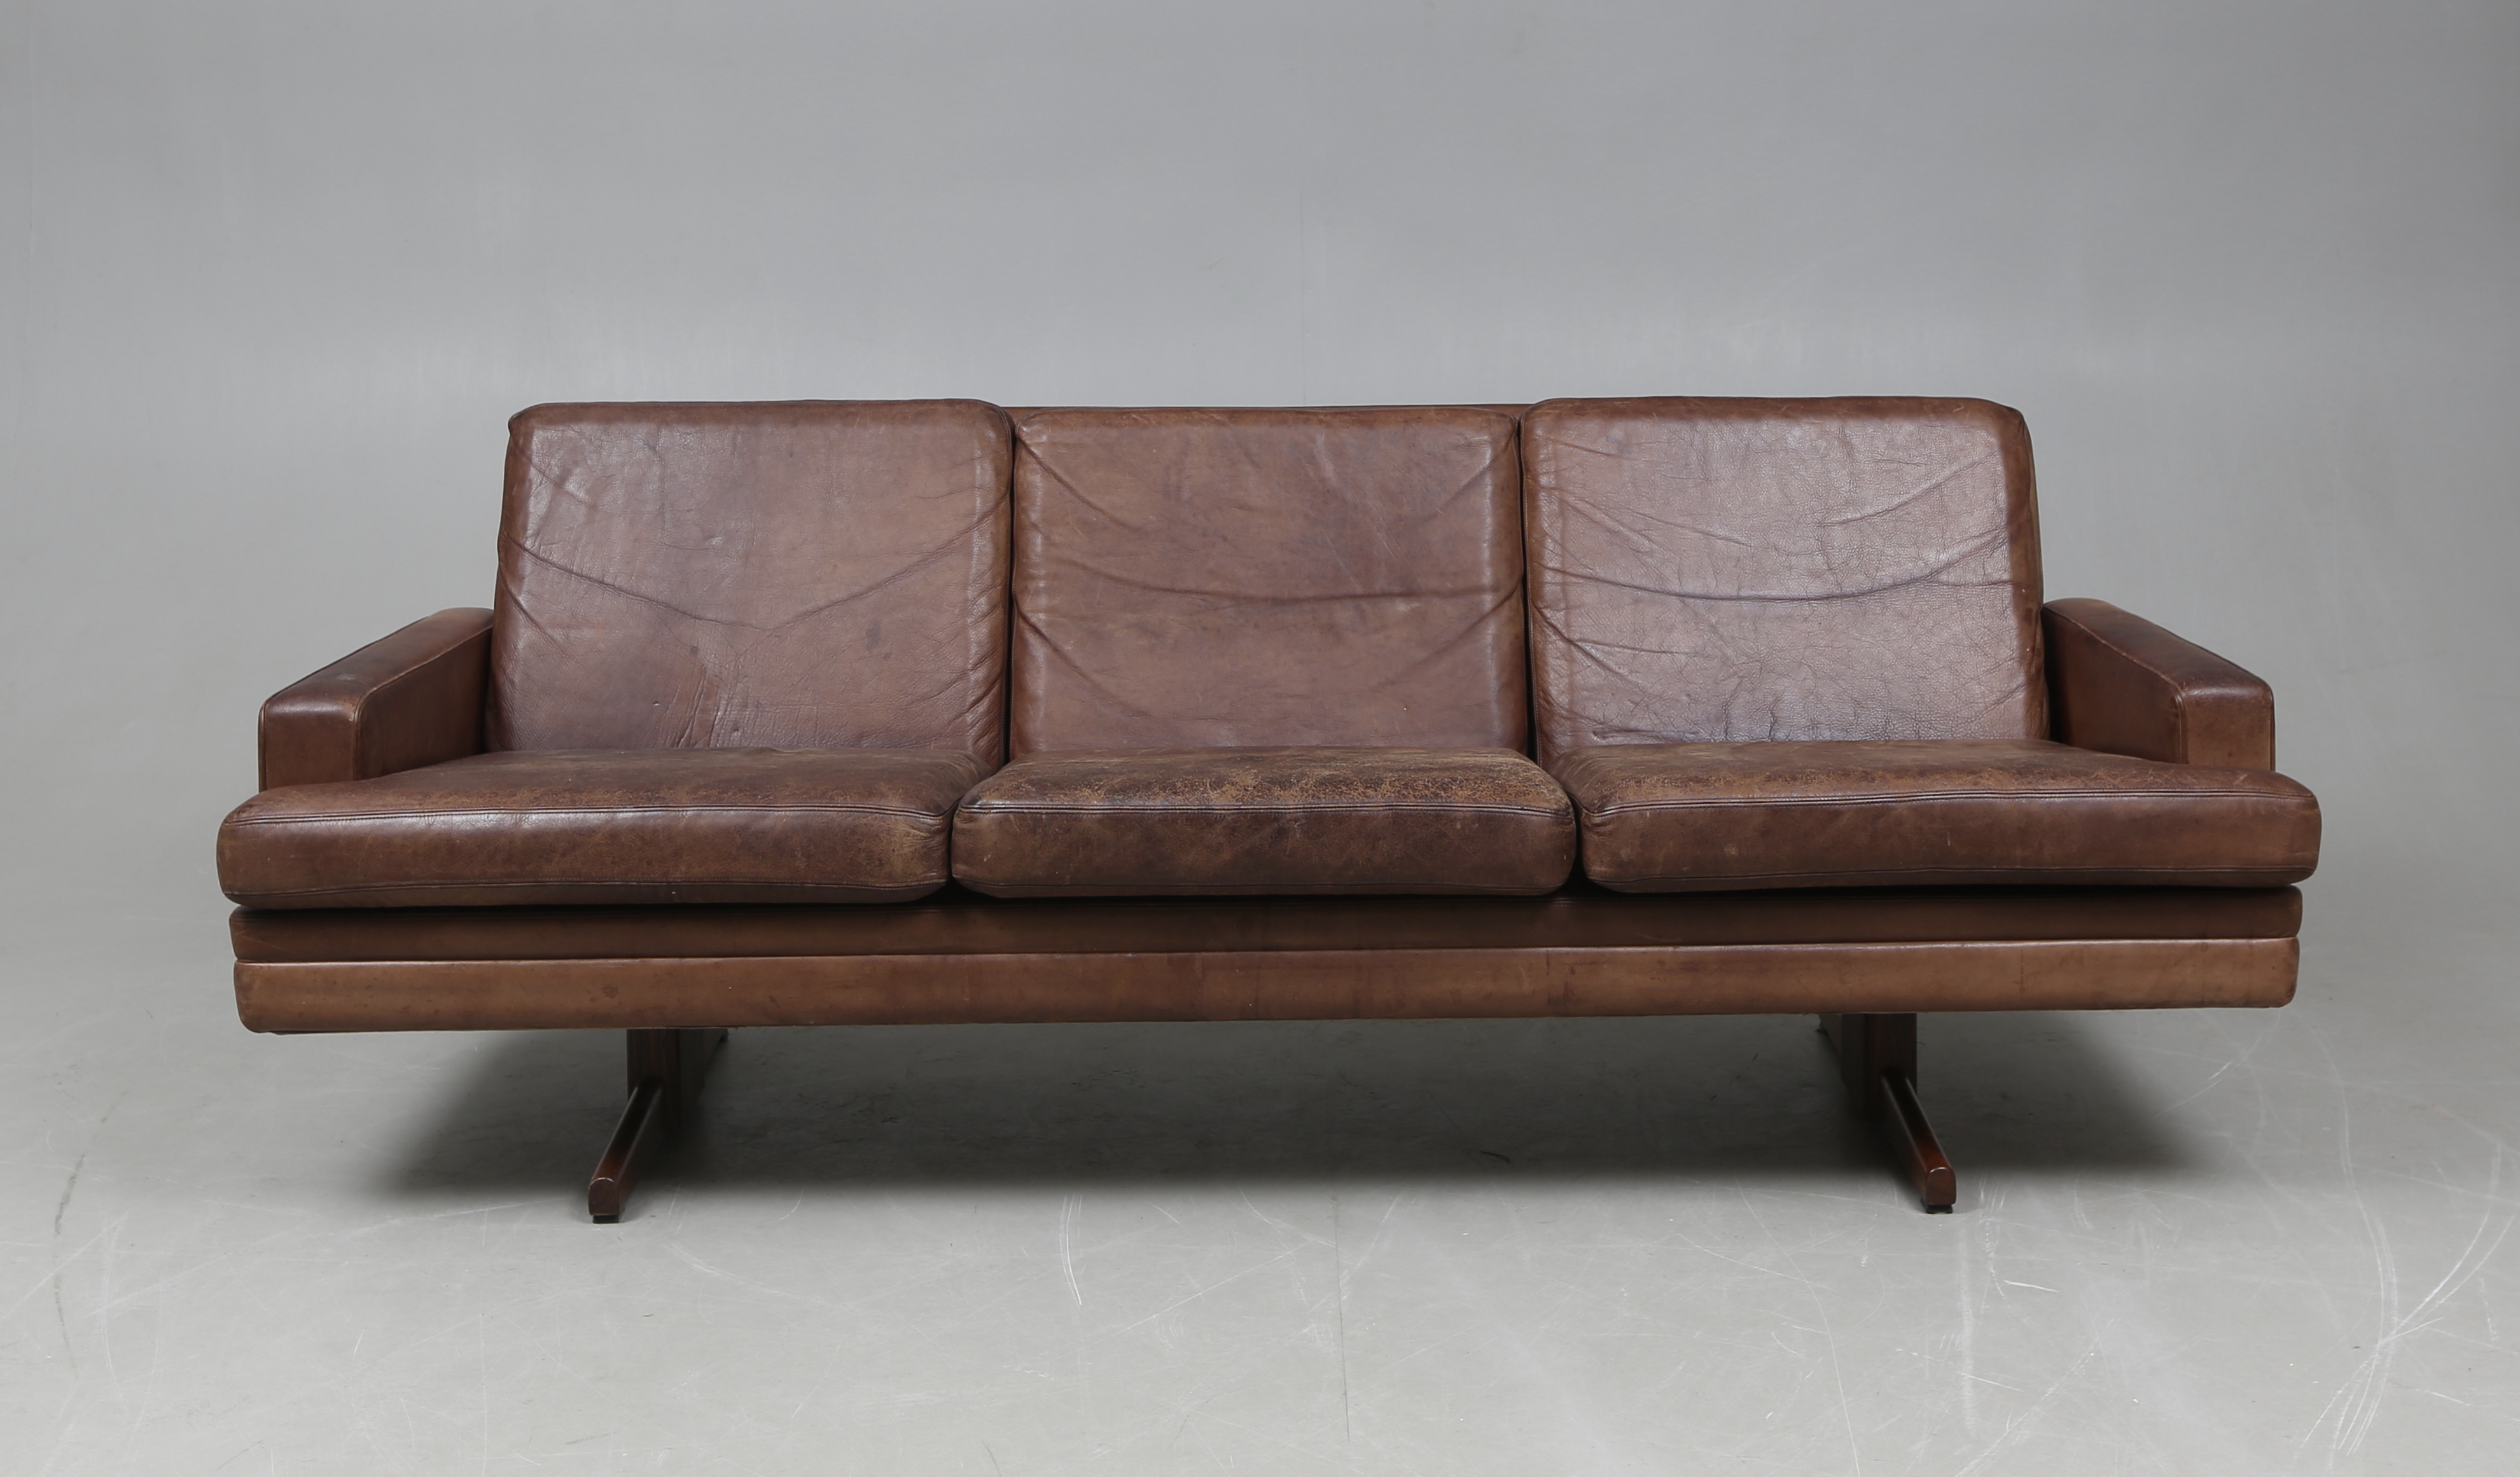 Topnotch SOFFA, Fredrik A. Kayser, Vatne Möbler, Norge,1960-tal. Furniture NW-45